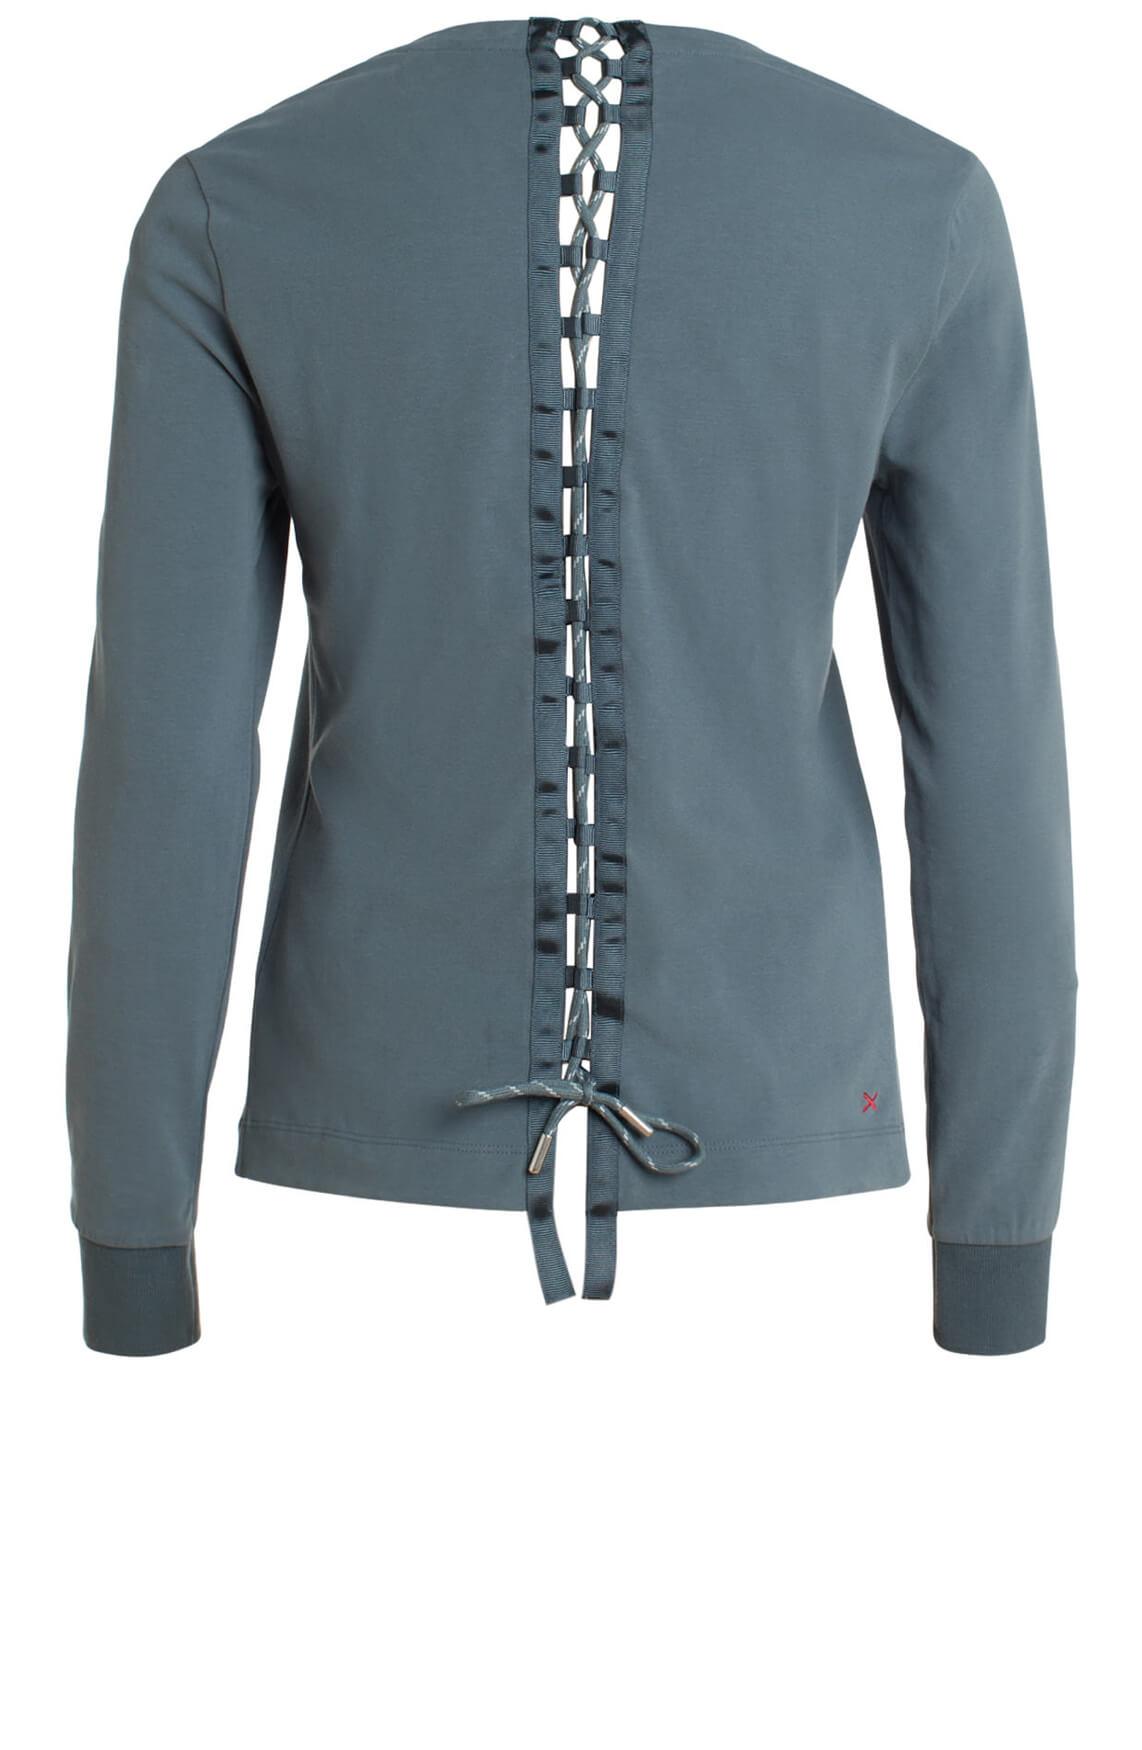 Anna Blue Dames Sweater met lace-up Grijs